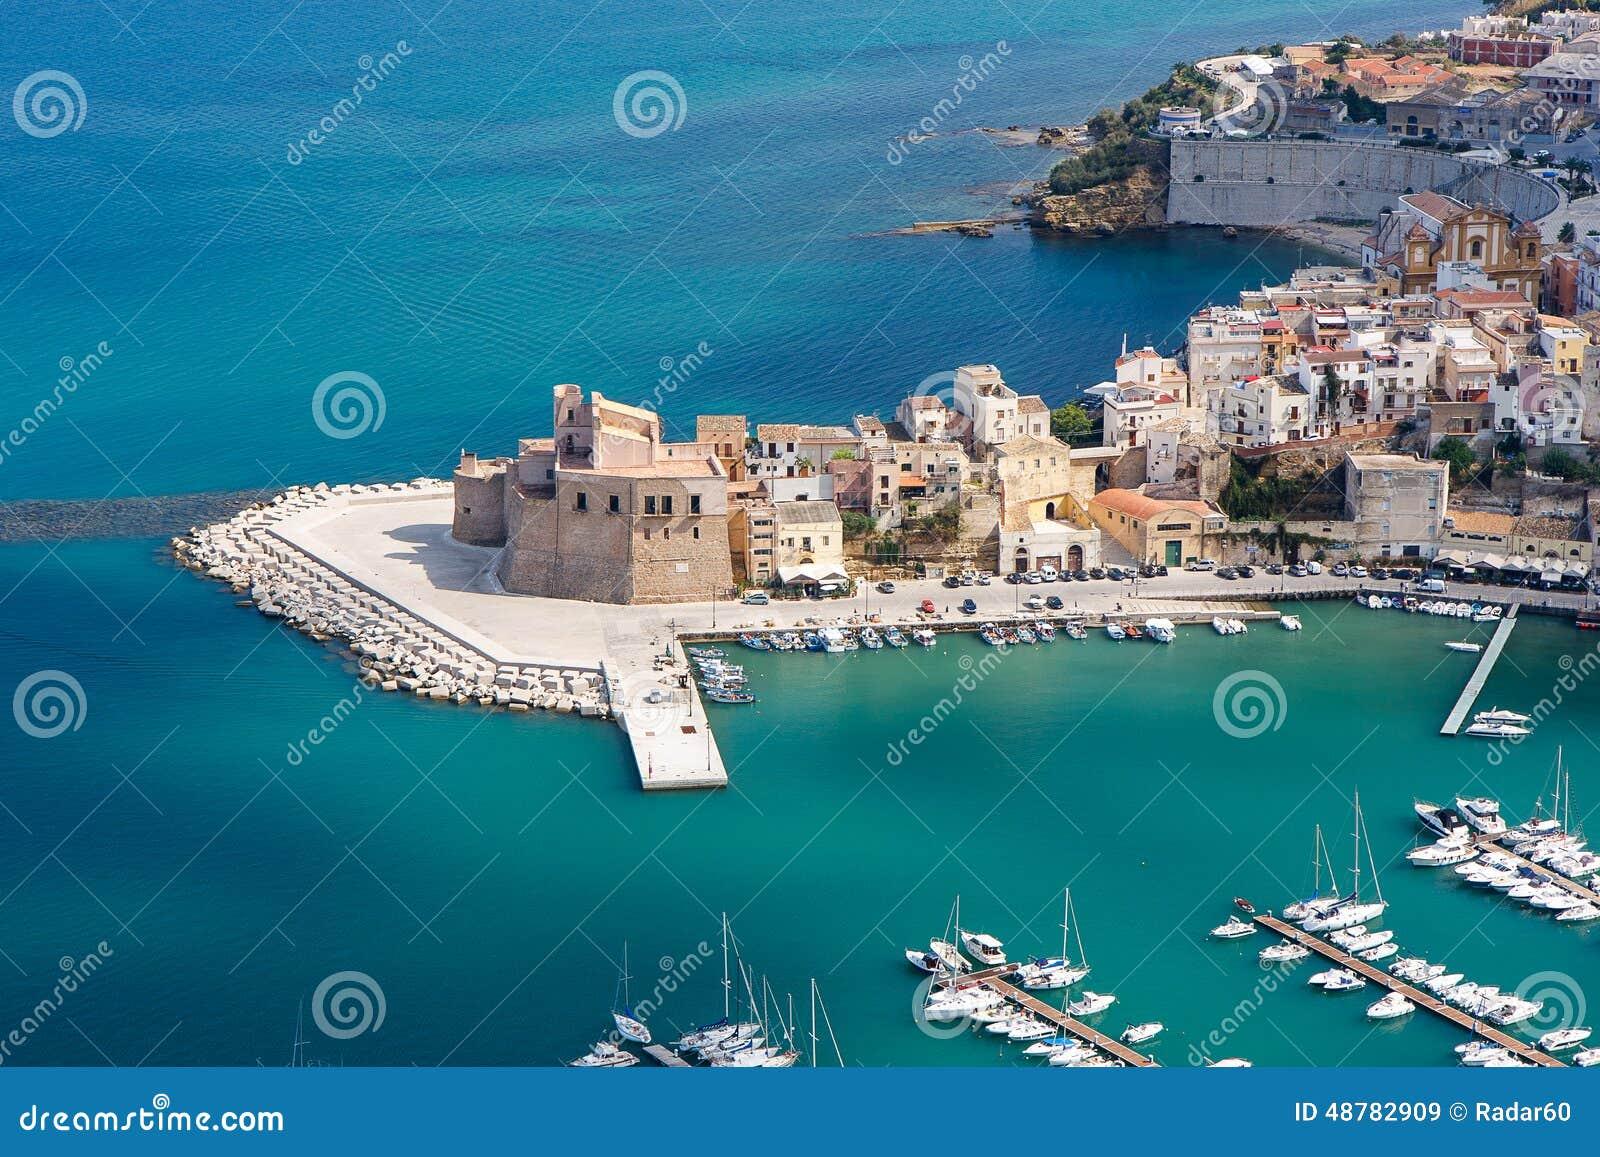 Castellammare del Golfo Italy  city pictures gallery : Castellammare Del Golfo, Sicily, Italy Stock Photo Image: 48782909